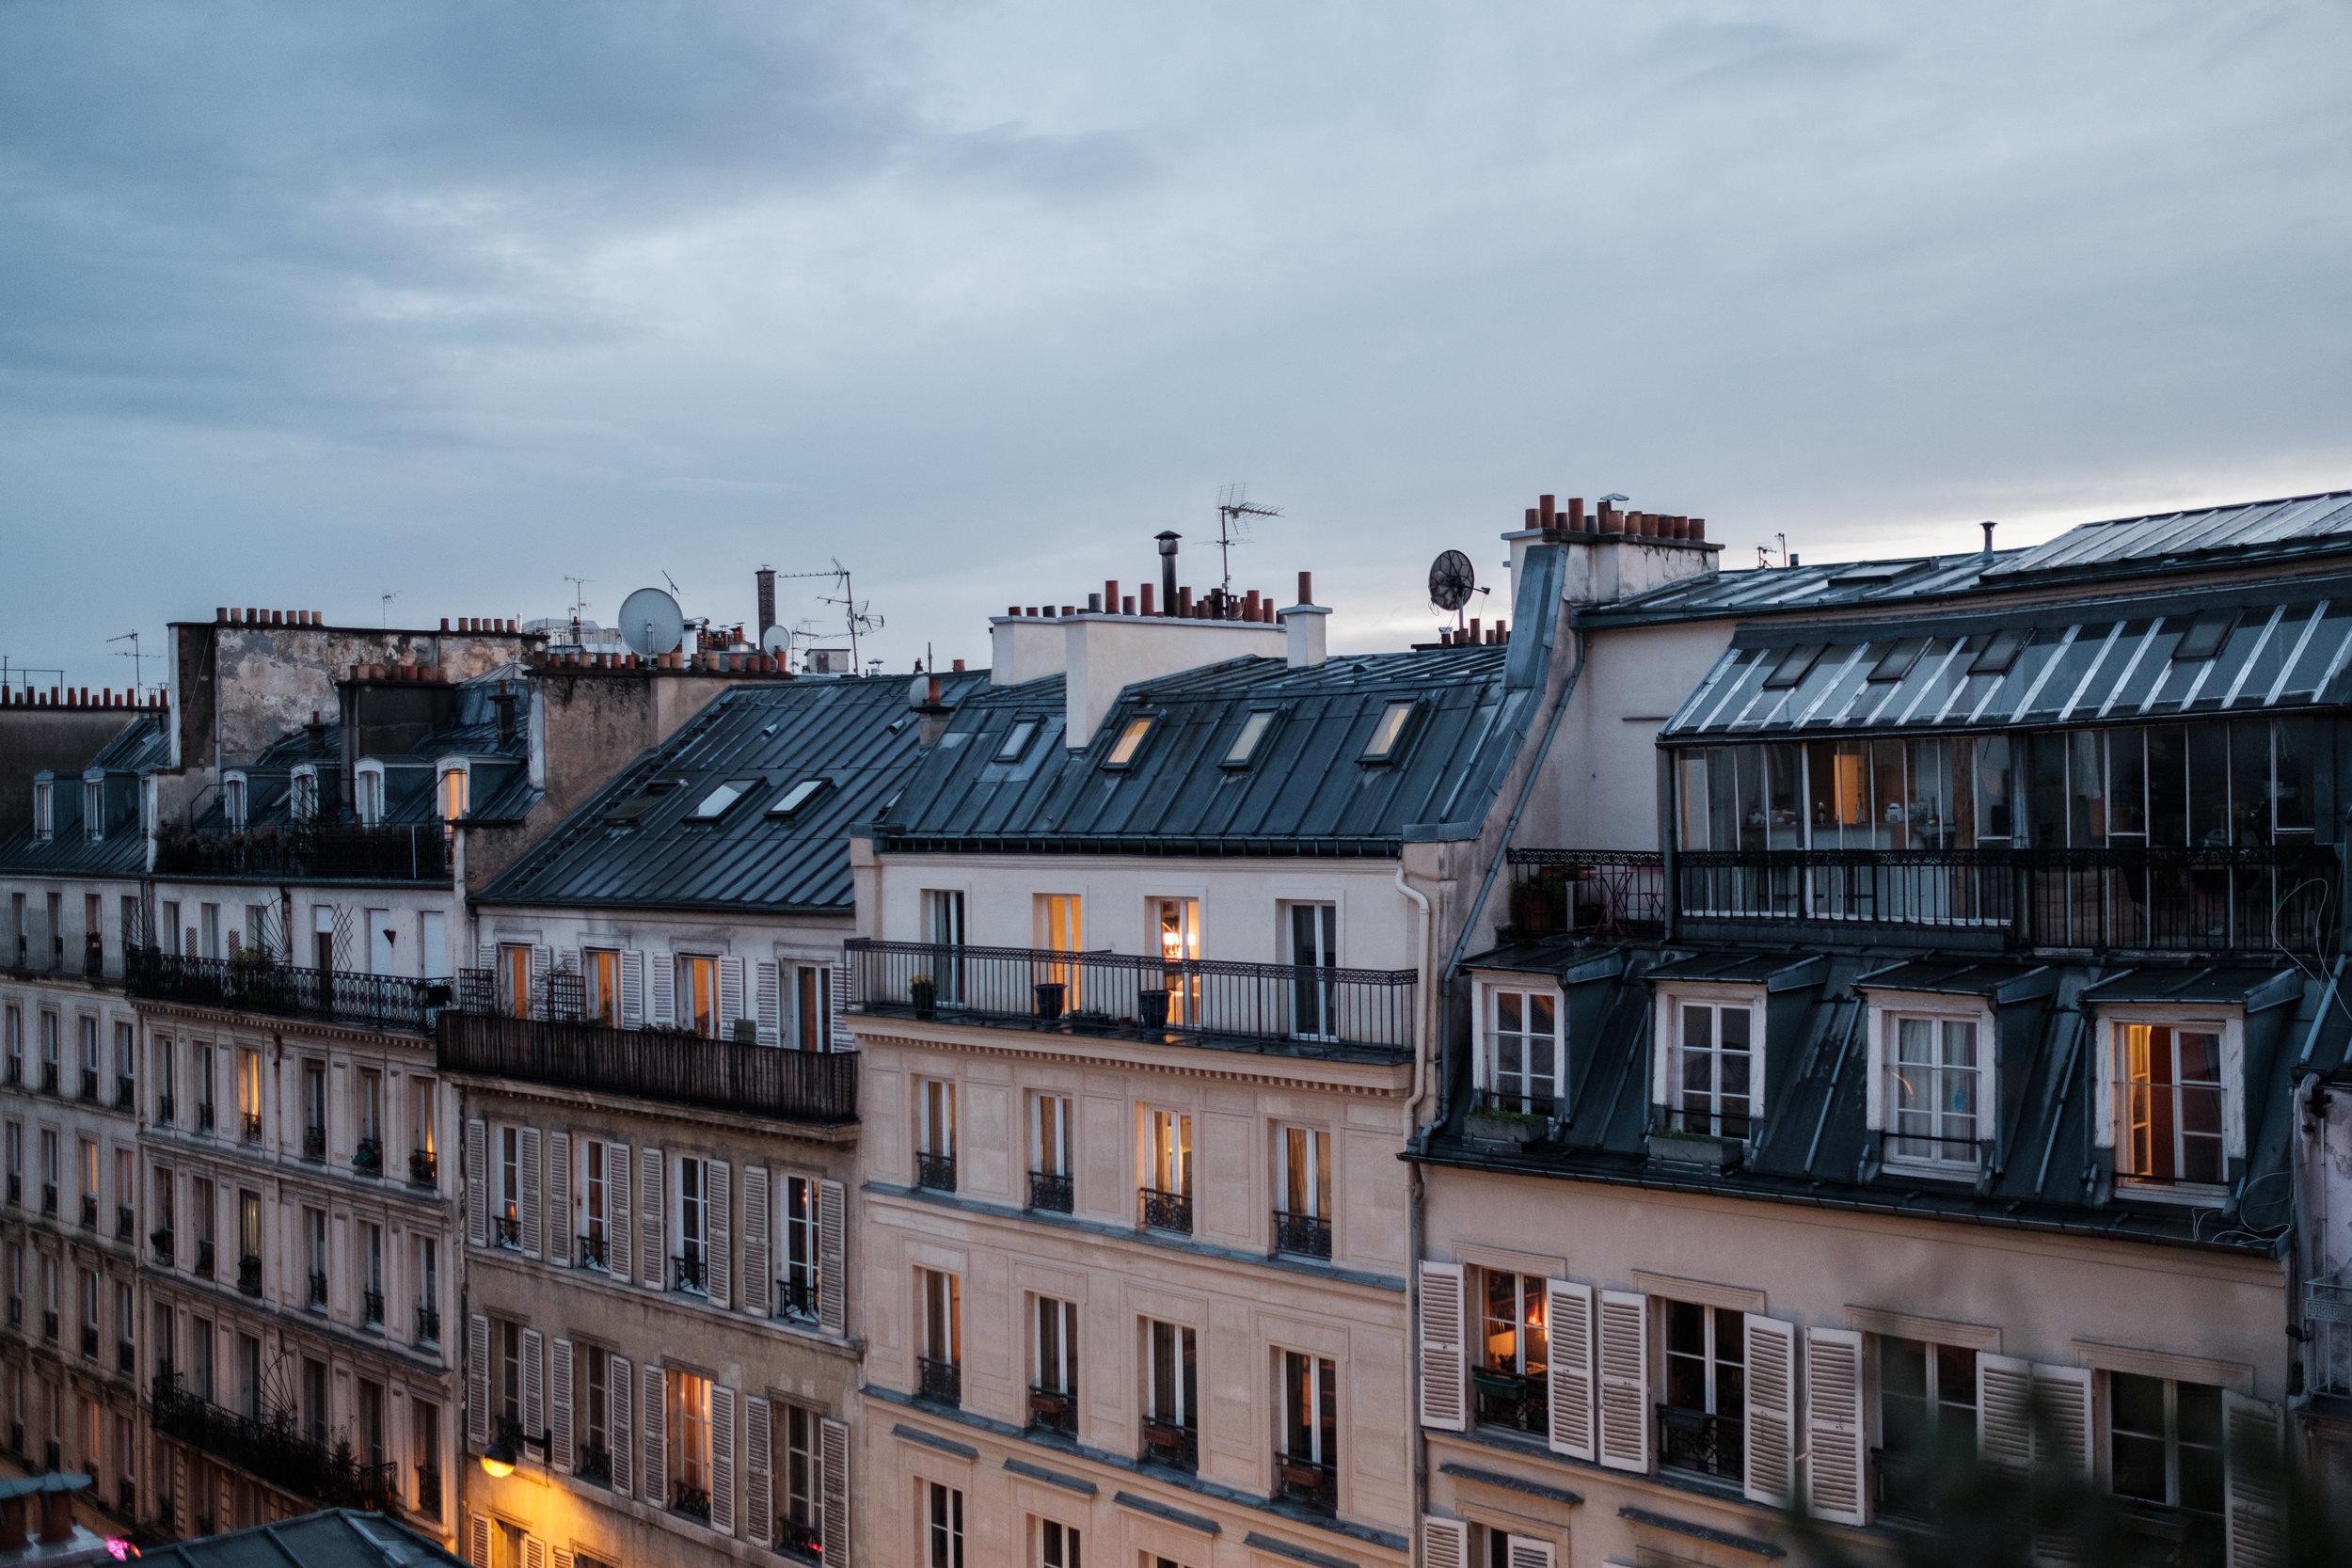 Beautiful view of Parisian rooftops